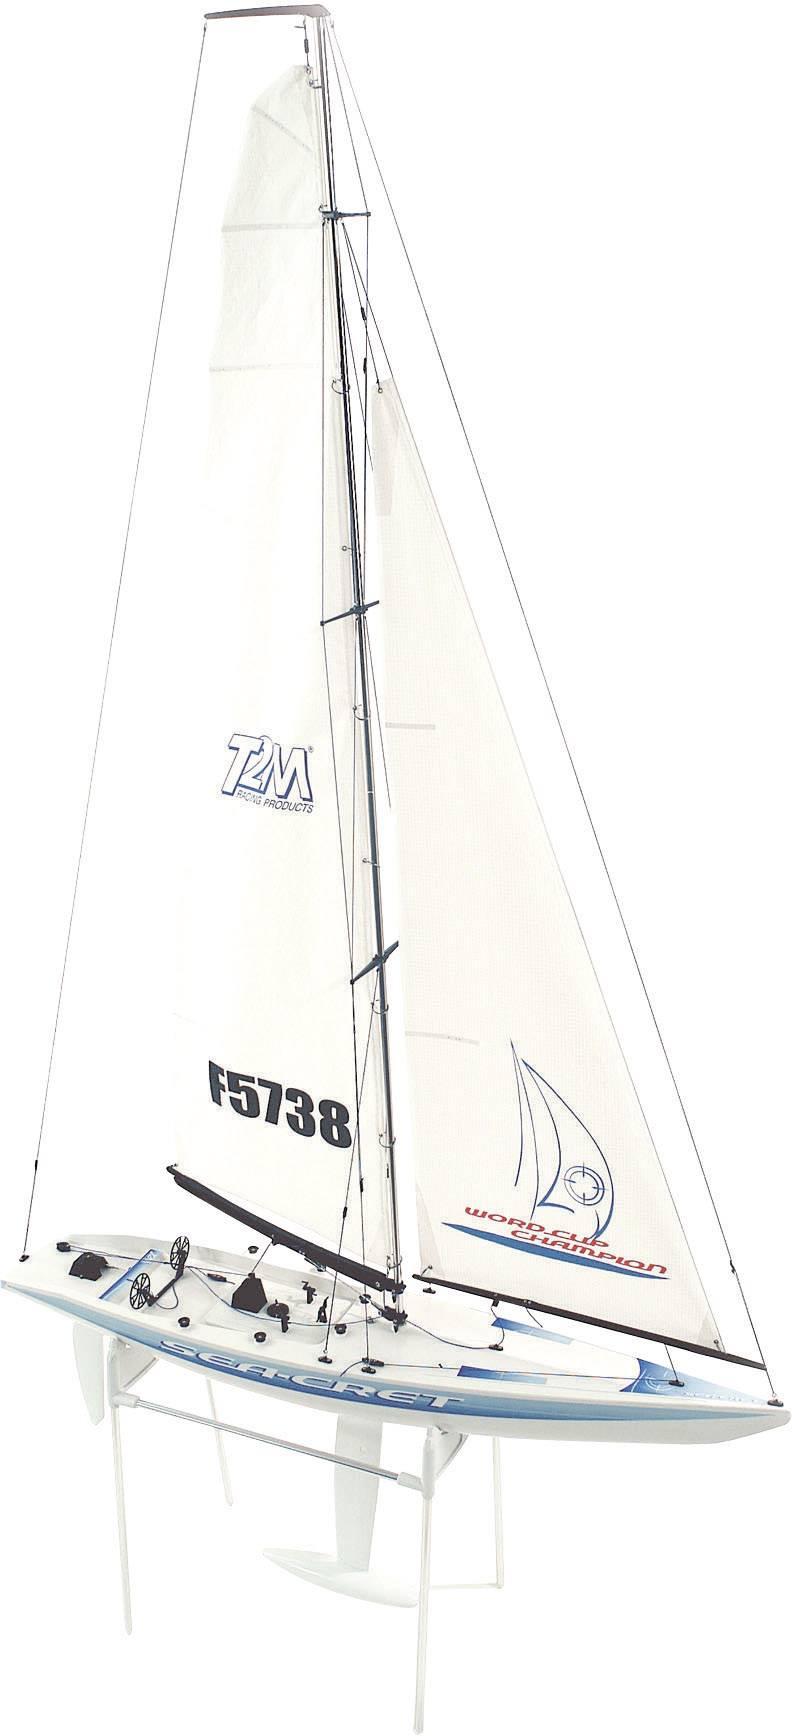 RC model plachetnice T2M Sea-Cret, 914 x 170 x 1850 mm, stavebnice